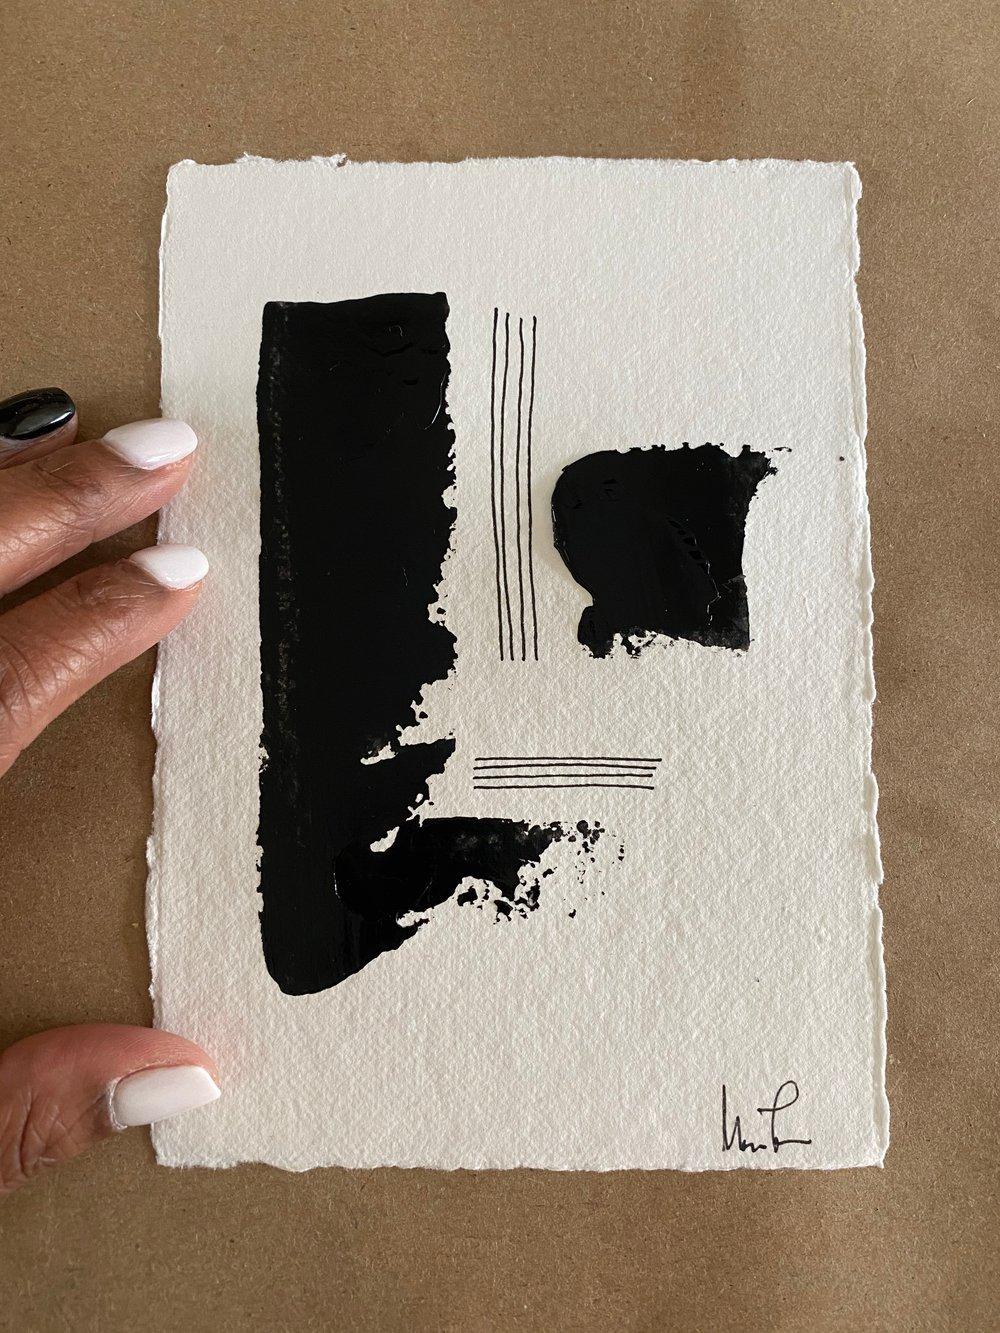 Image of Black Tie Cotton Rag (40)